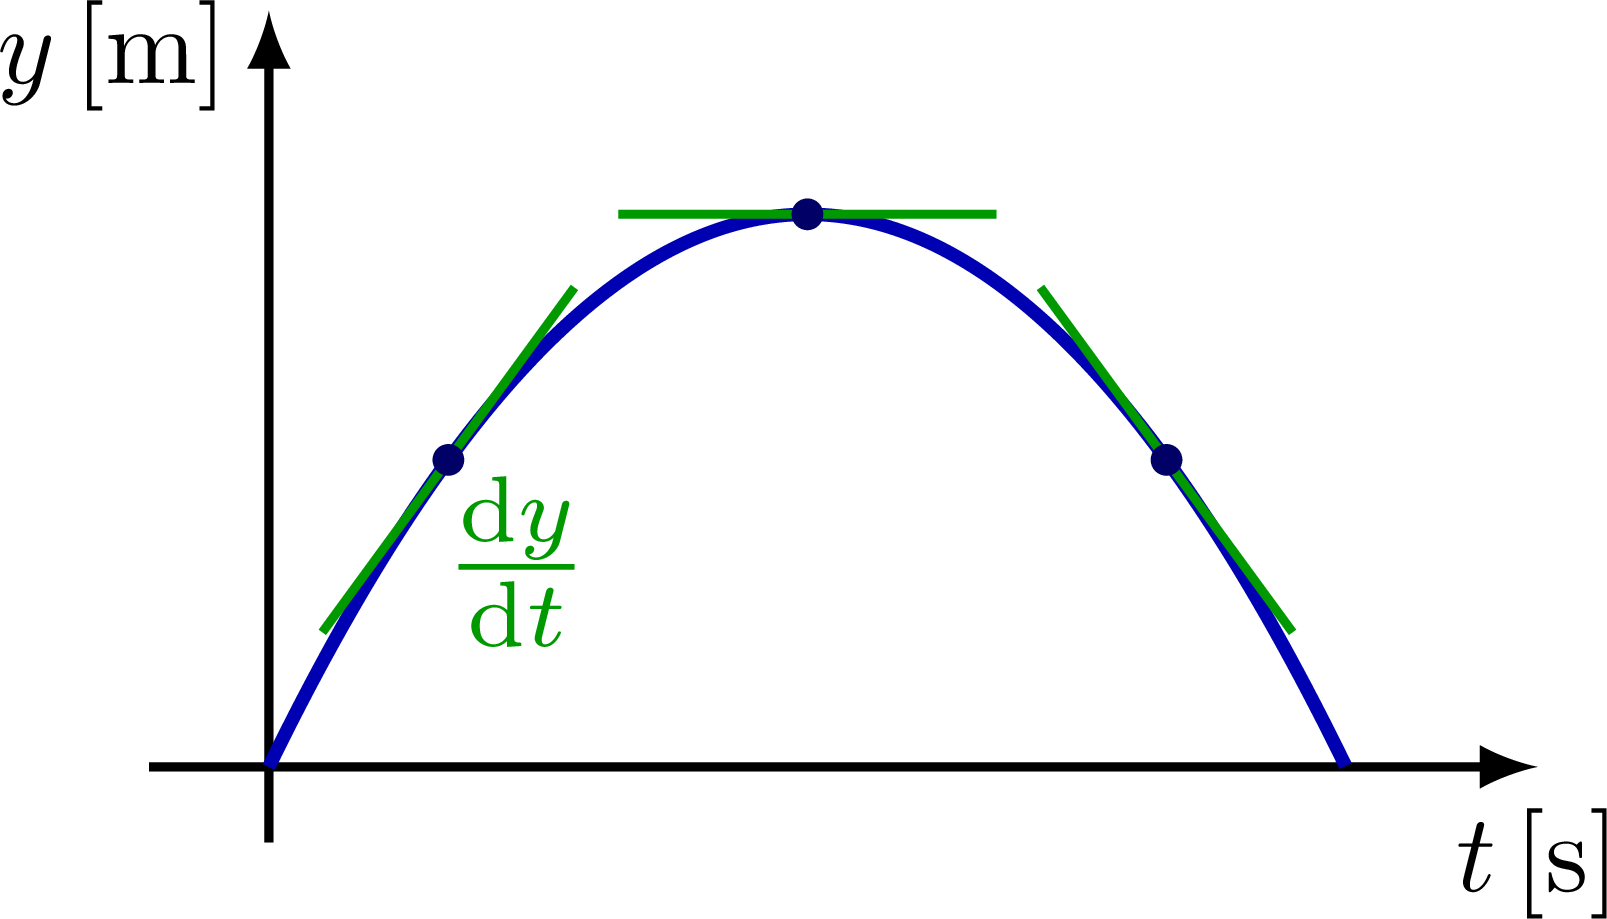 kinematics_curves-007.png